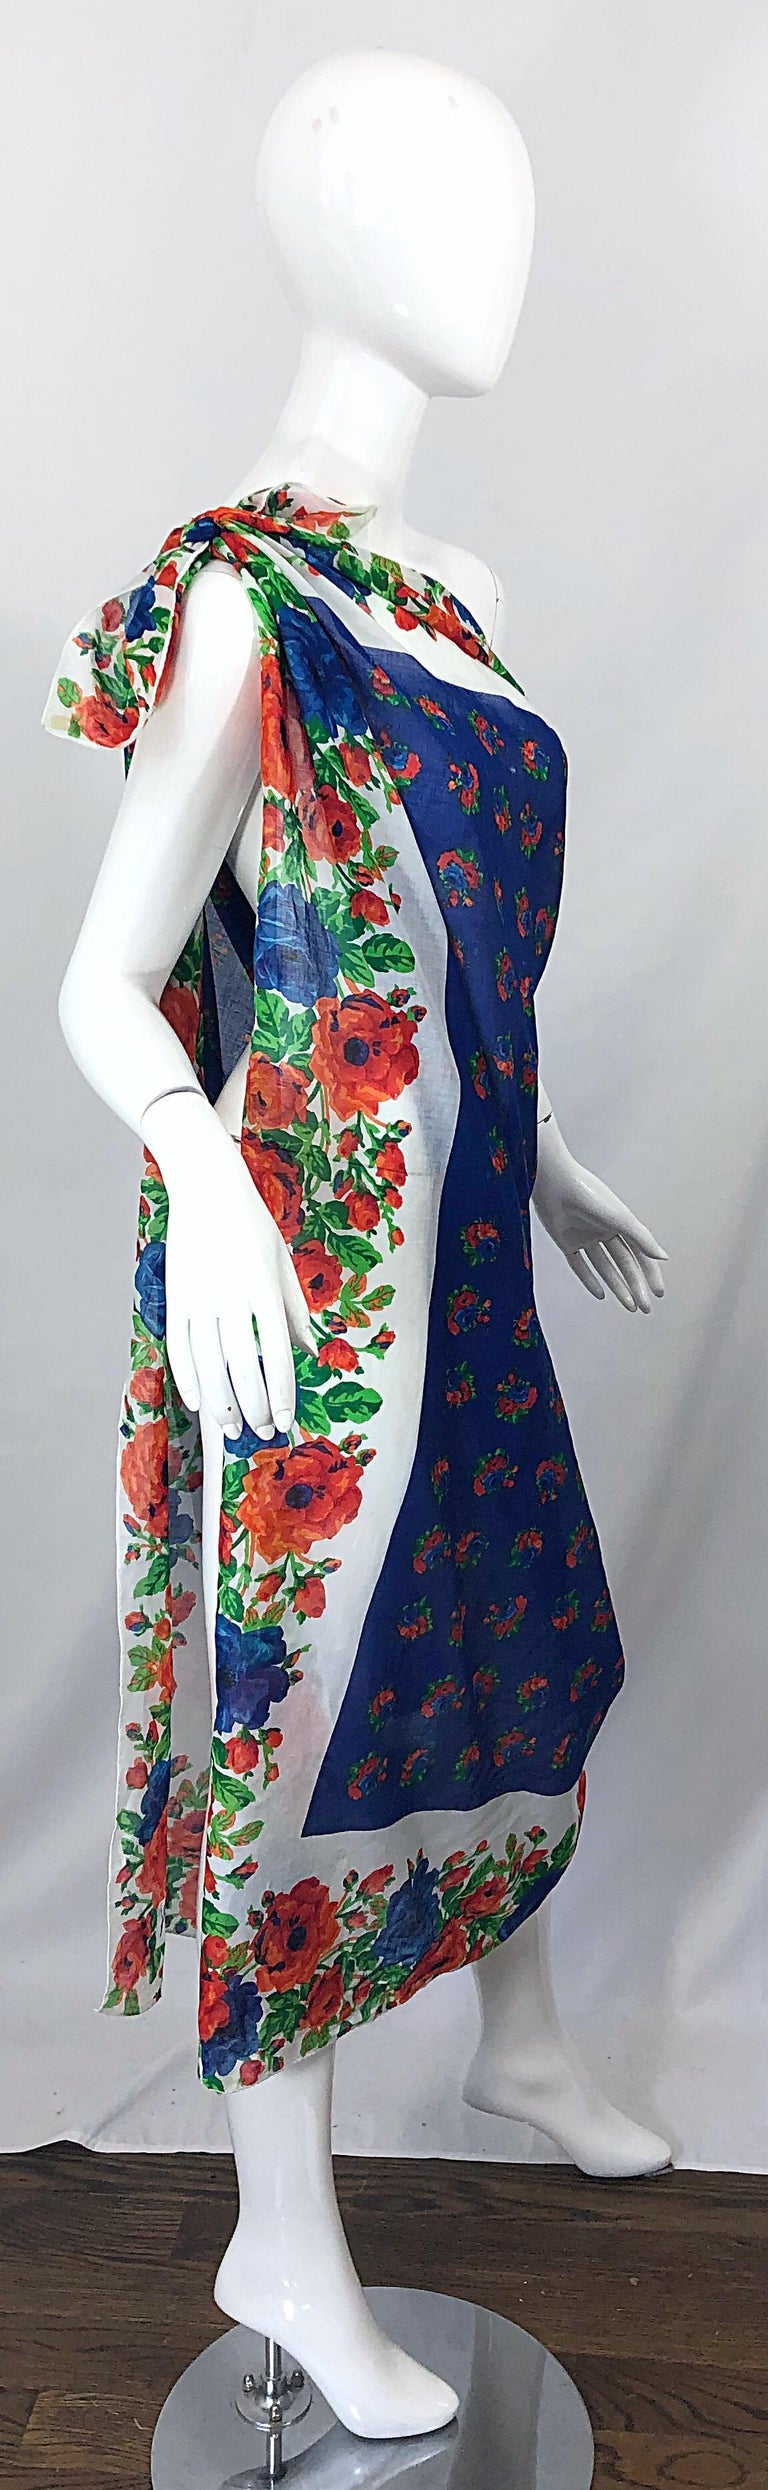 Huge Vintage Yves Saint Laurent YSL 54 x 54 Inch Cotton Voile Scarf Parero Shawl For Sale 8